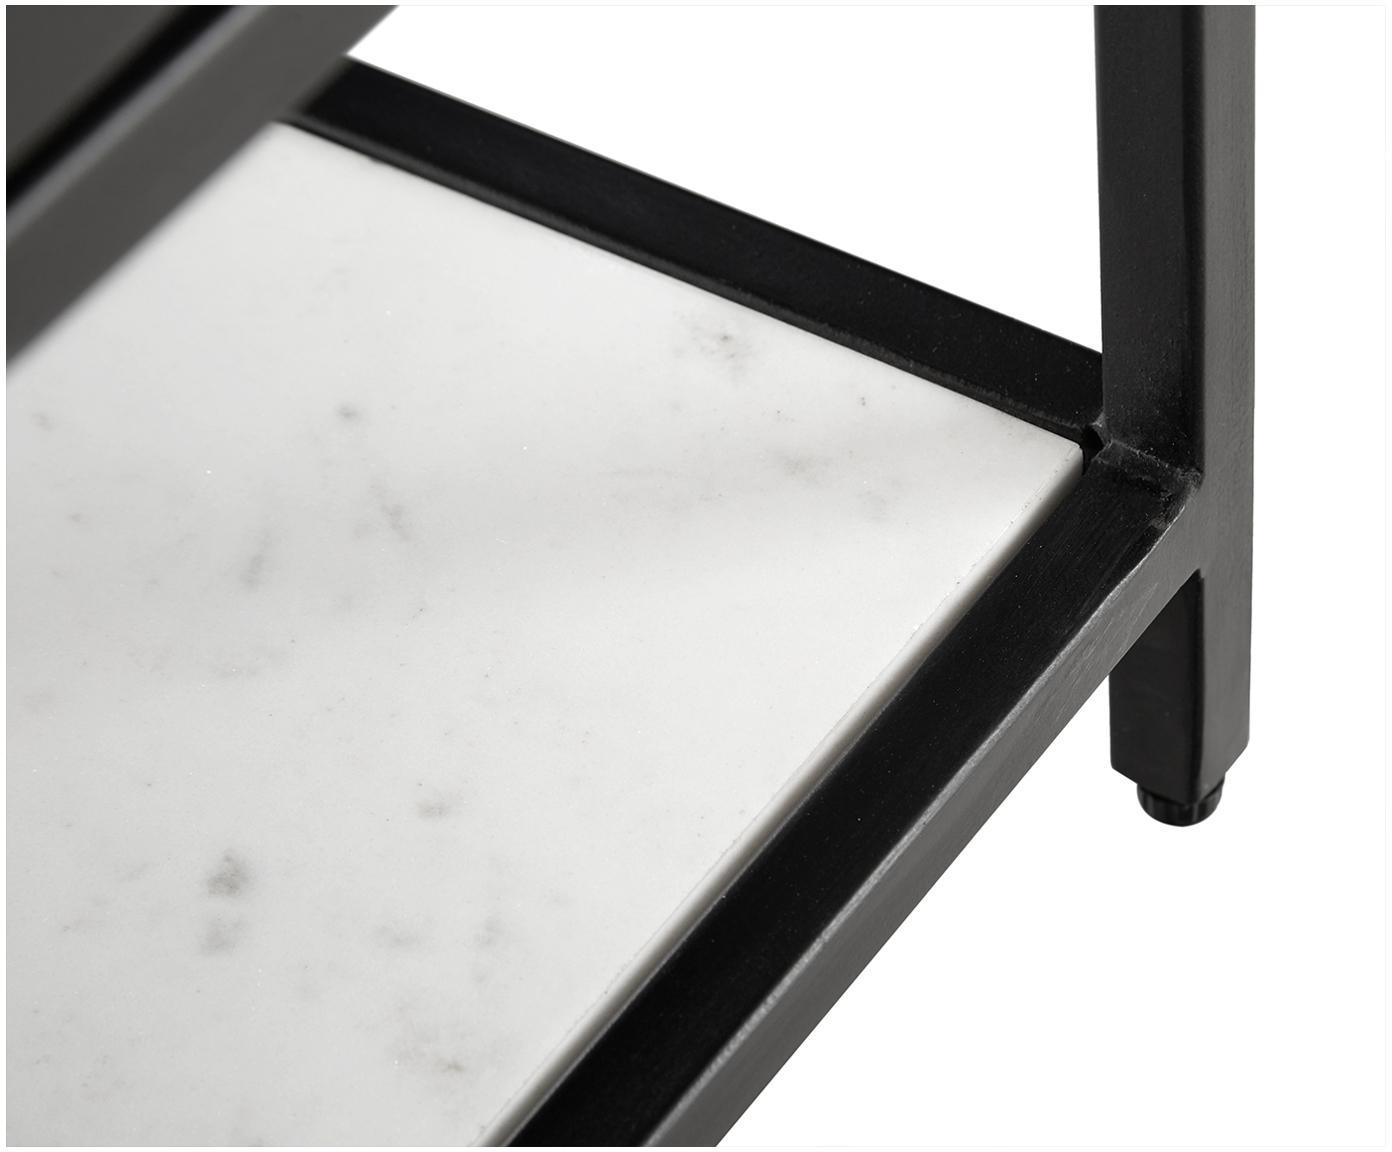 Lowboard Lenny met marmeren plank, Frame: MDF met gelakt mangohoutf, Plank: marmer, Frame: gepoedercoat metaal, Zwart, wit-grijs marmer, 150 x 55 cm